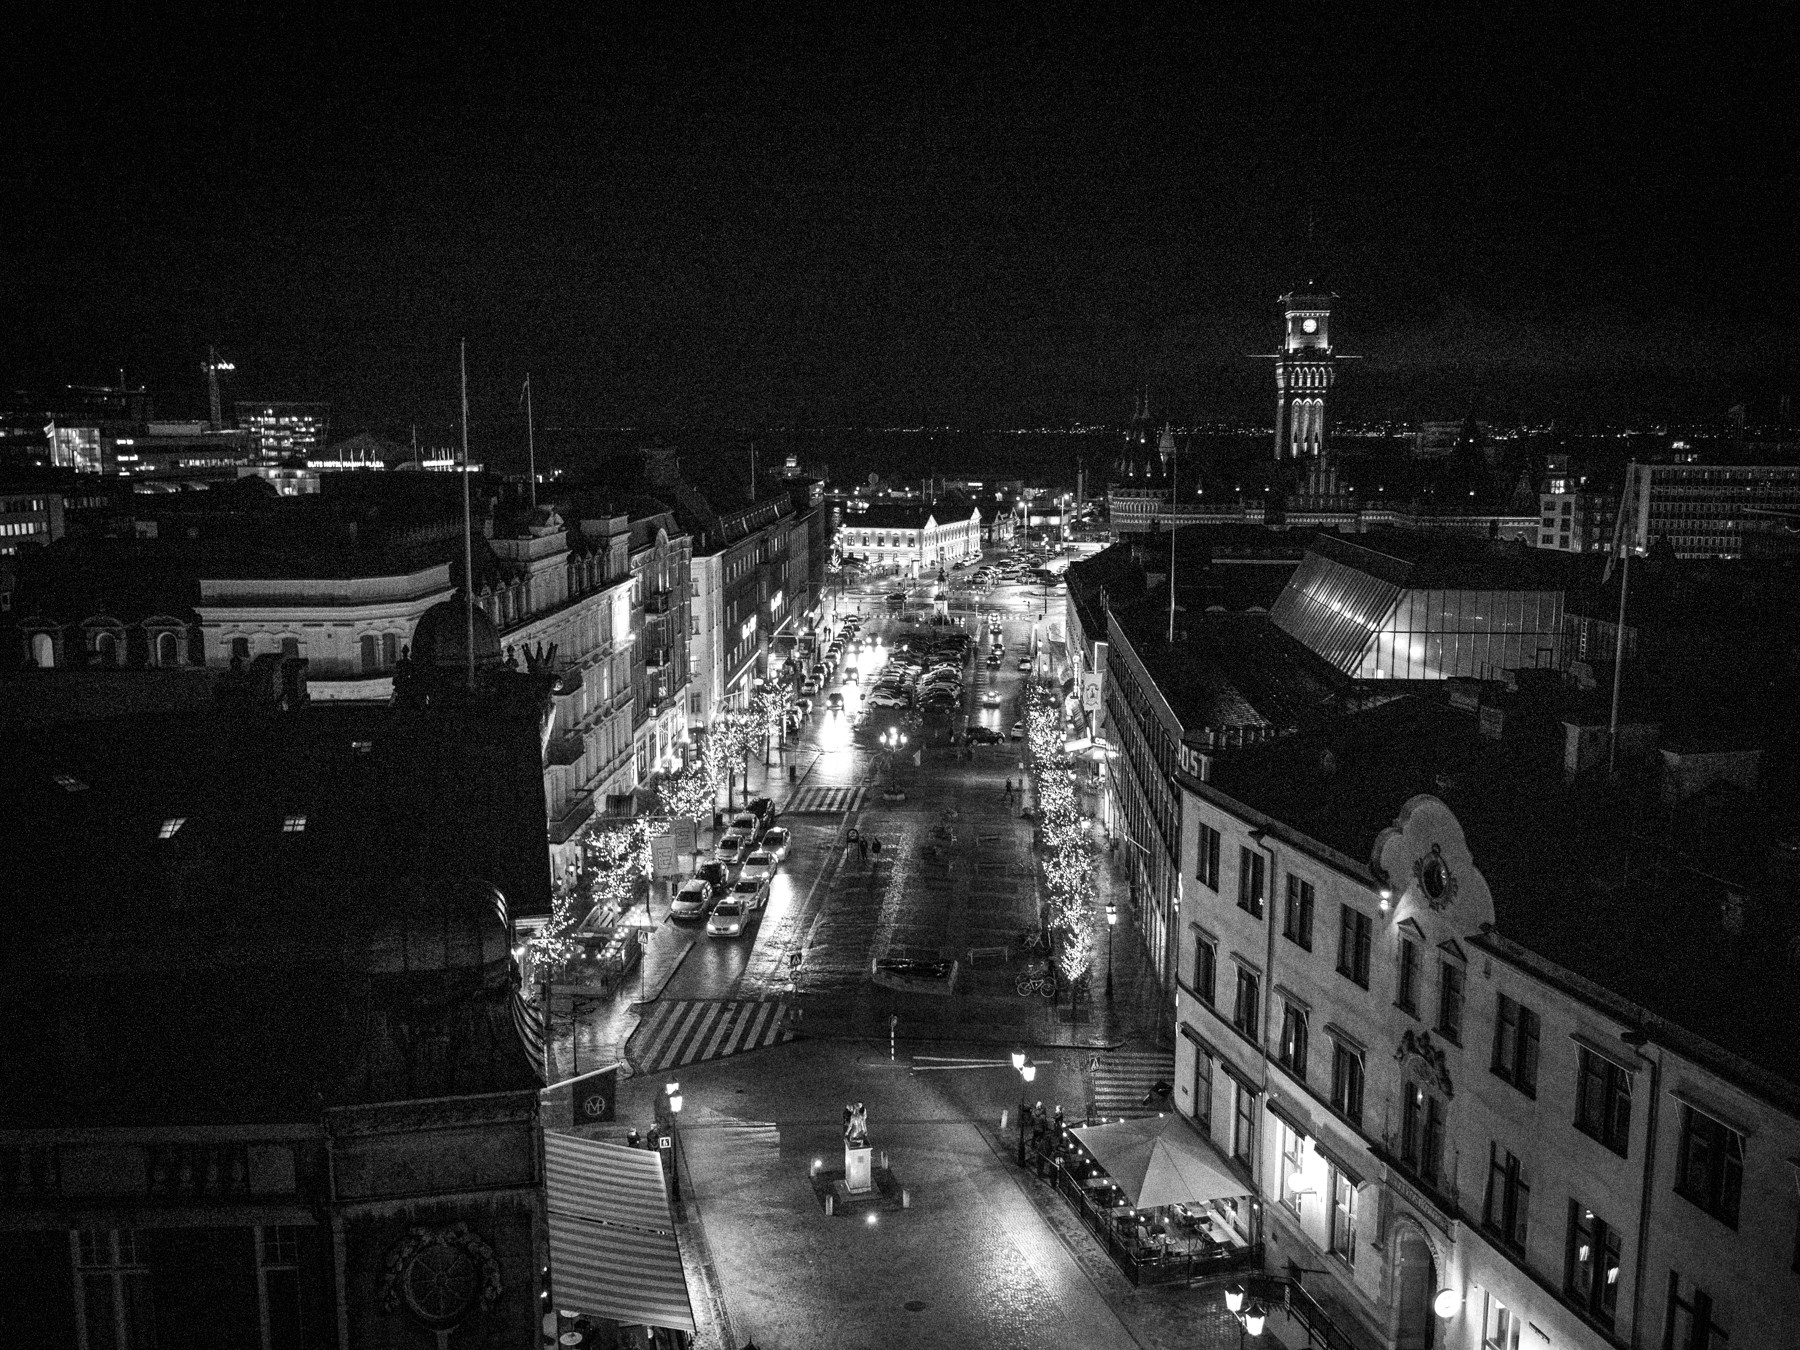 Helsingborg downtown og skyline set fra Kernen (Kärnan)